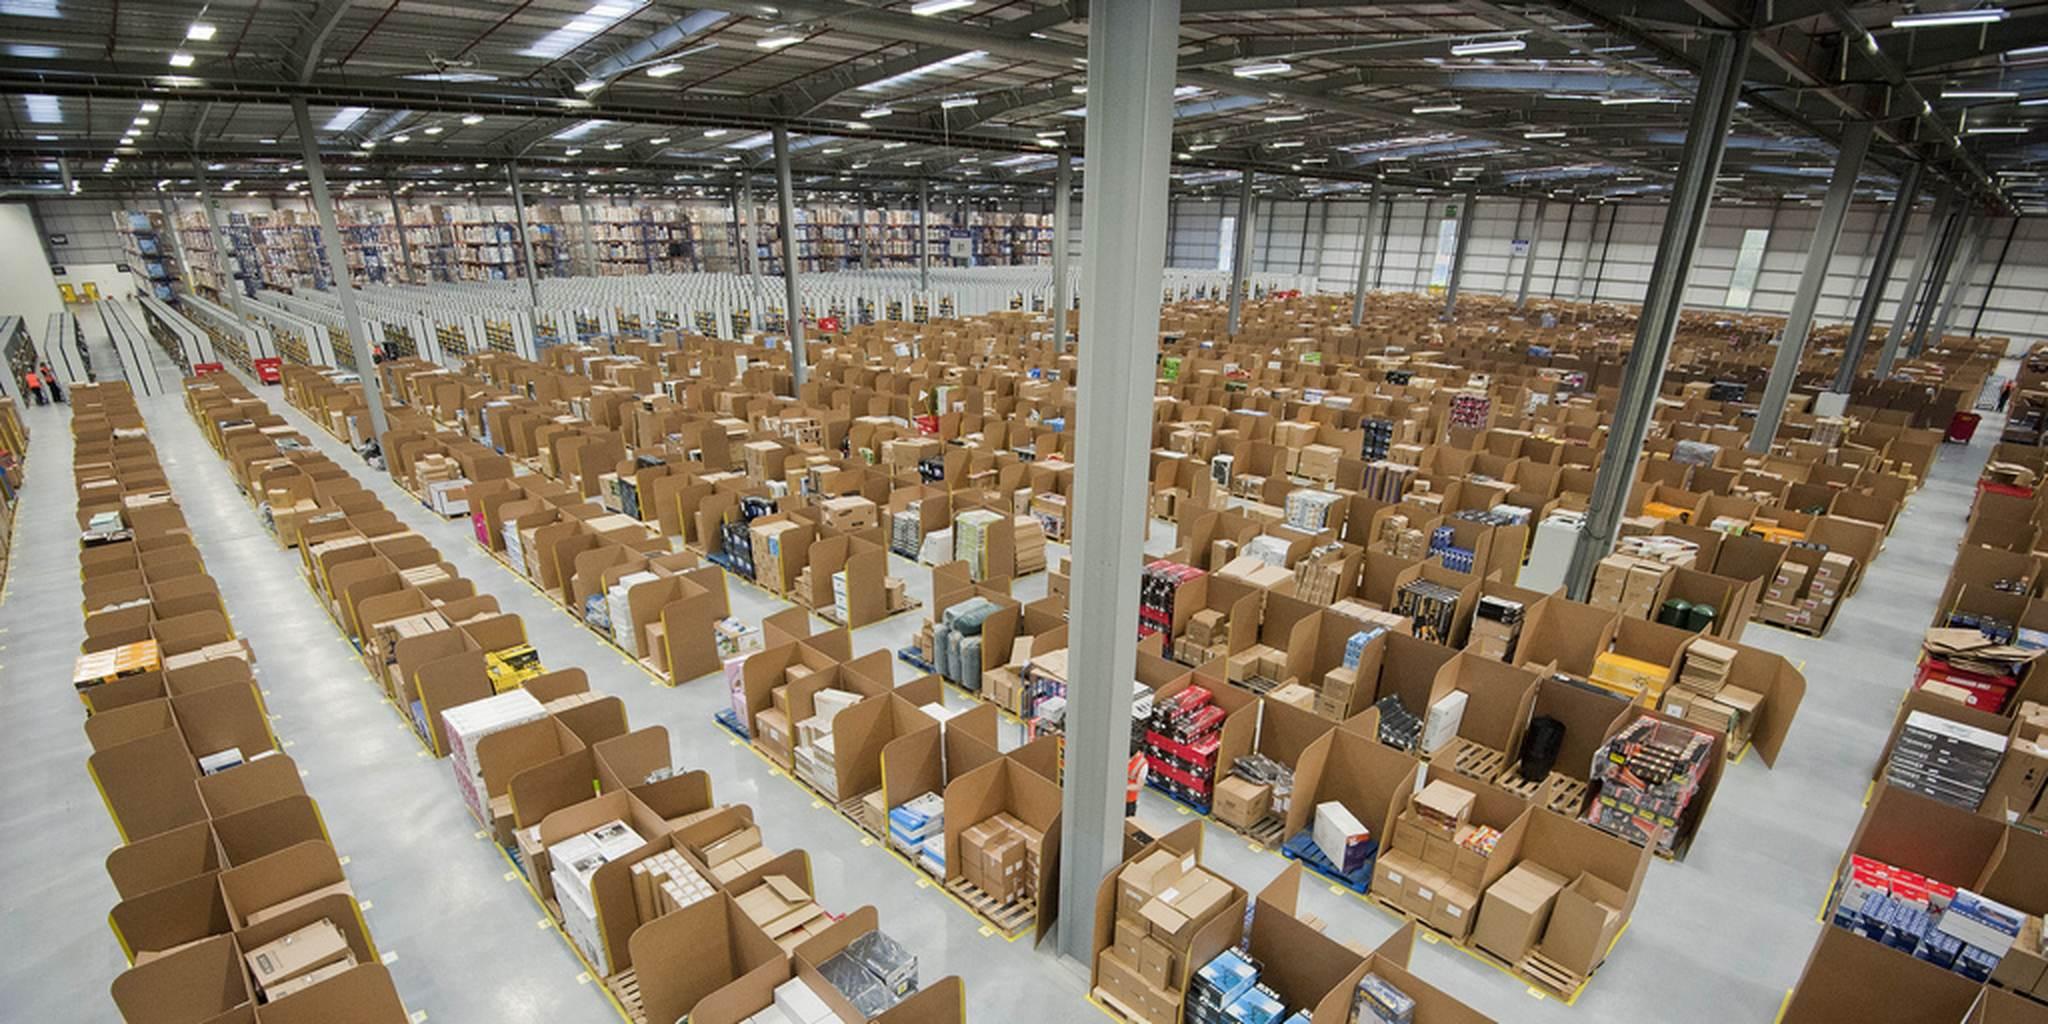 AMAZON MILLION SQUARE FOOT WAREHOUSE